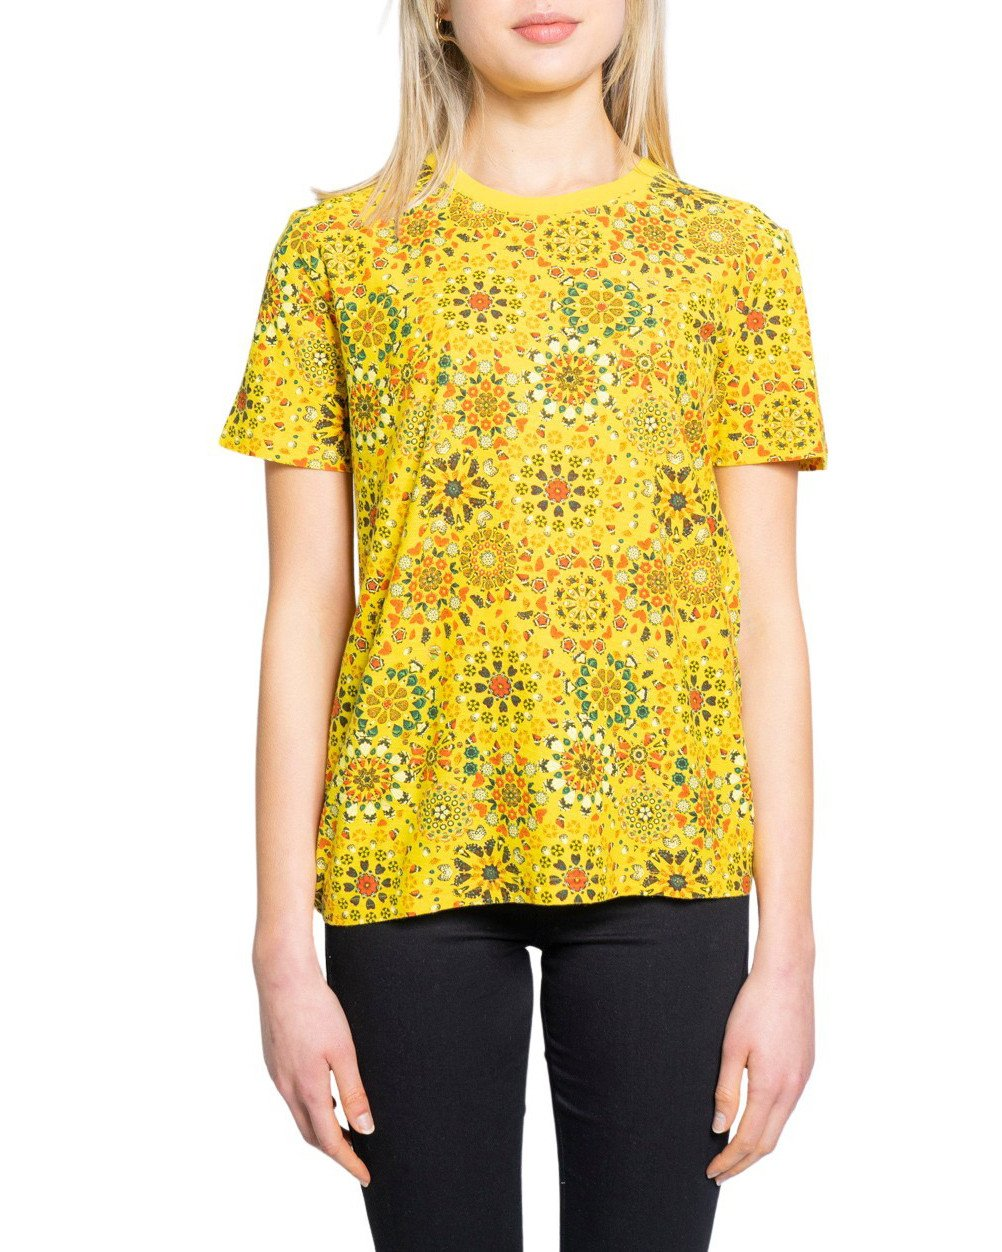 Desigual Women's T-Shirt Various Colours 189400 - yellow XL